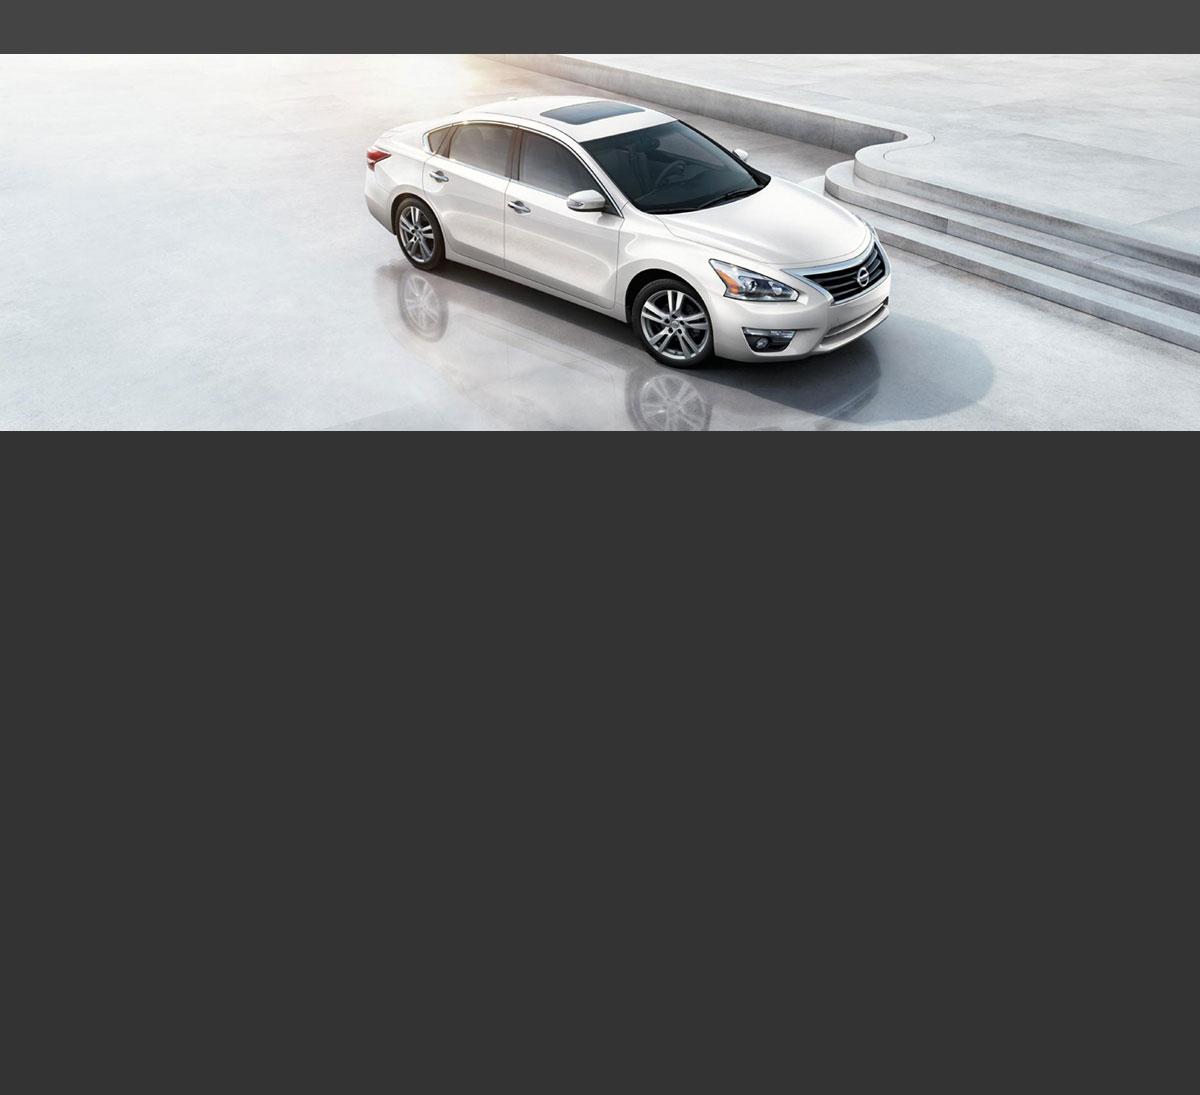 Lexus Dealers In Washington Dc Area: Washington DC Dealer